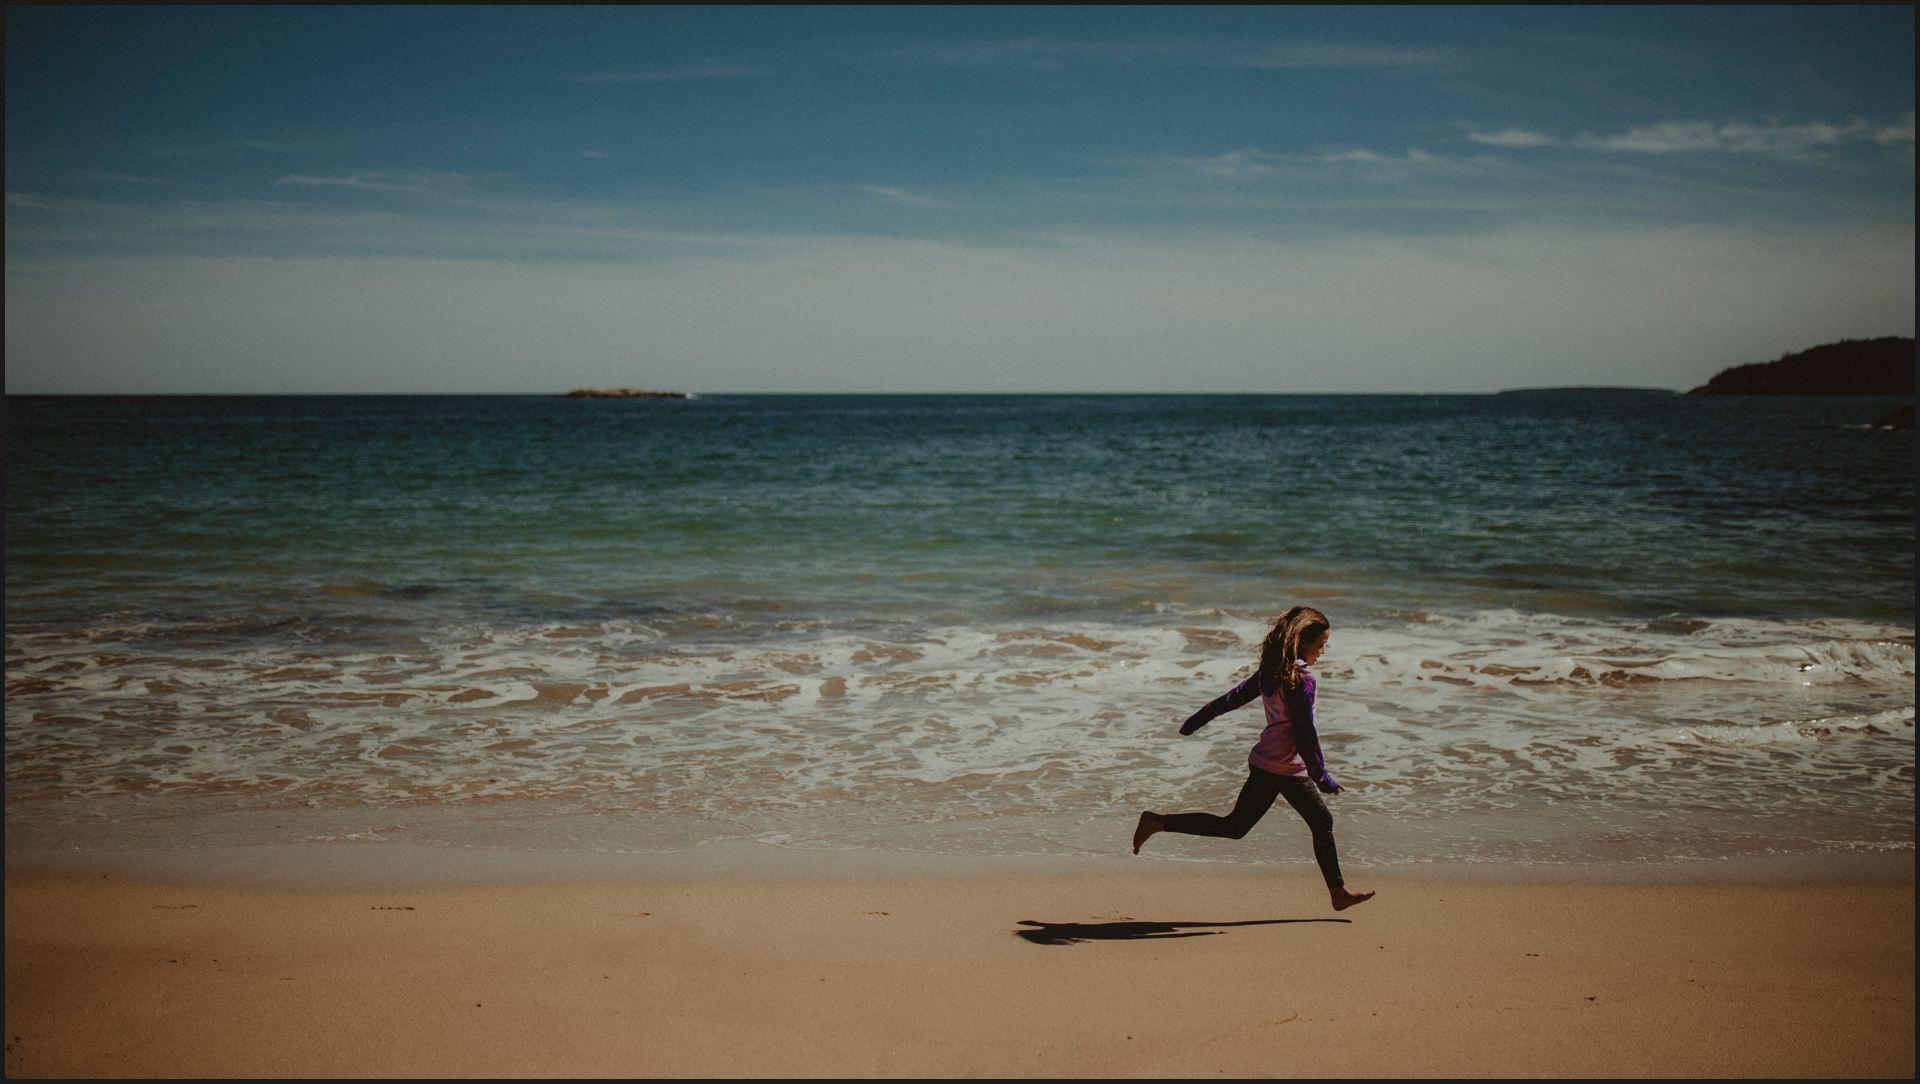 landscape, maine, acadia national park, beach, ocean, child